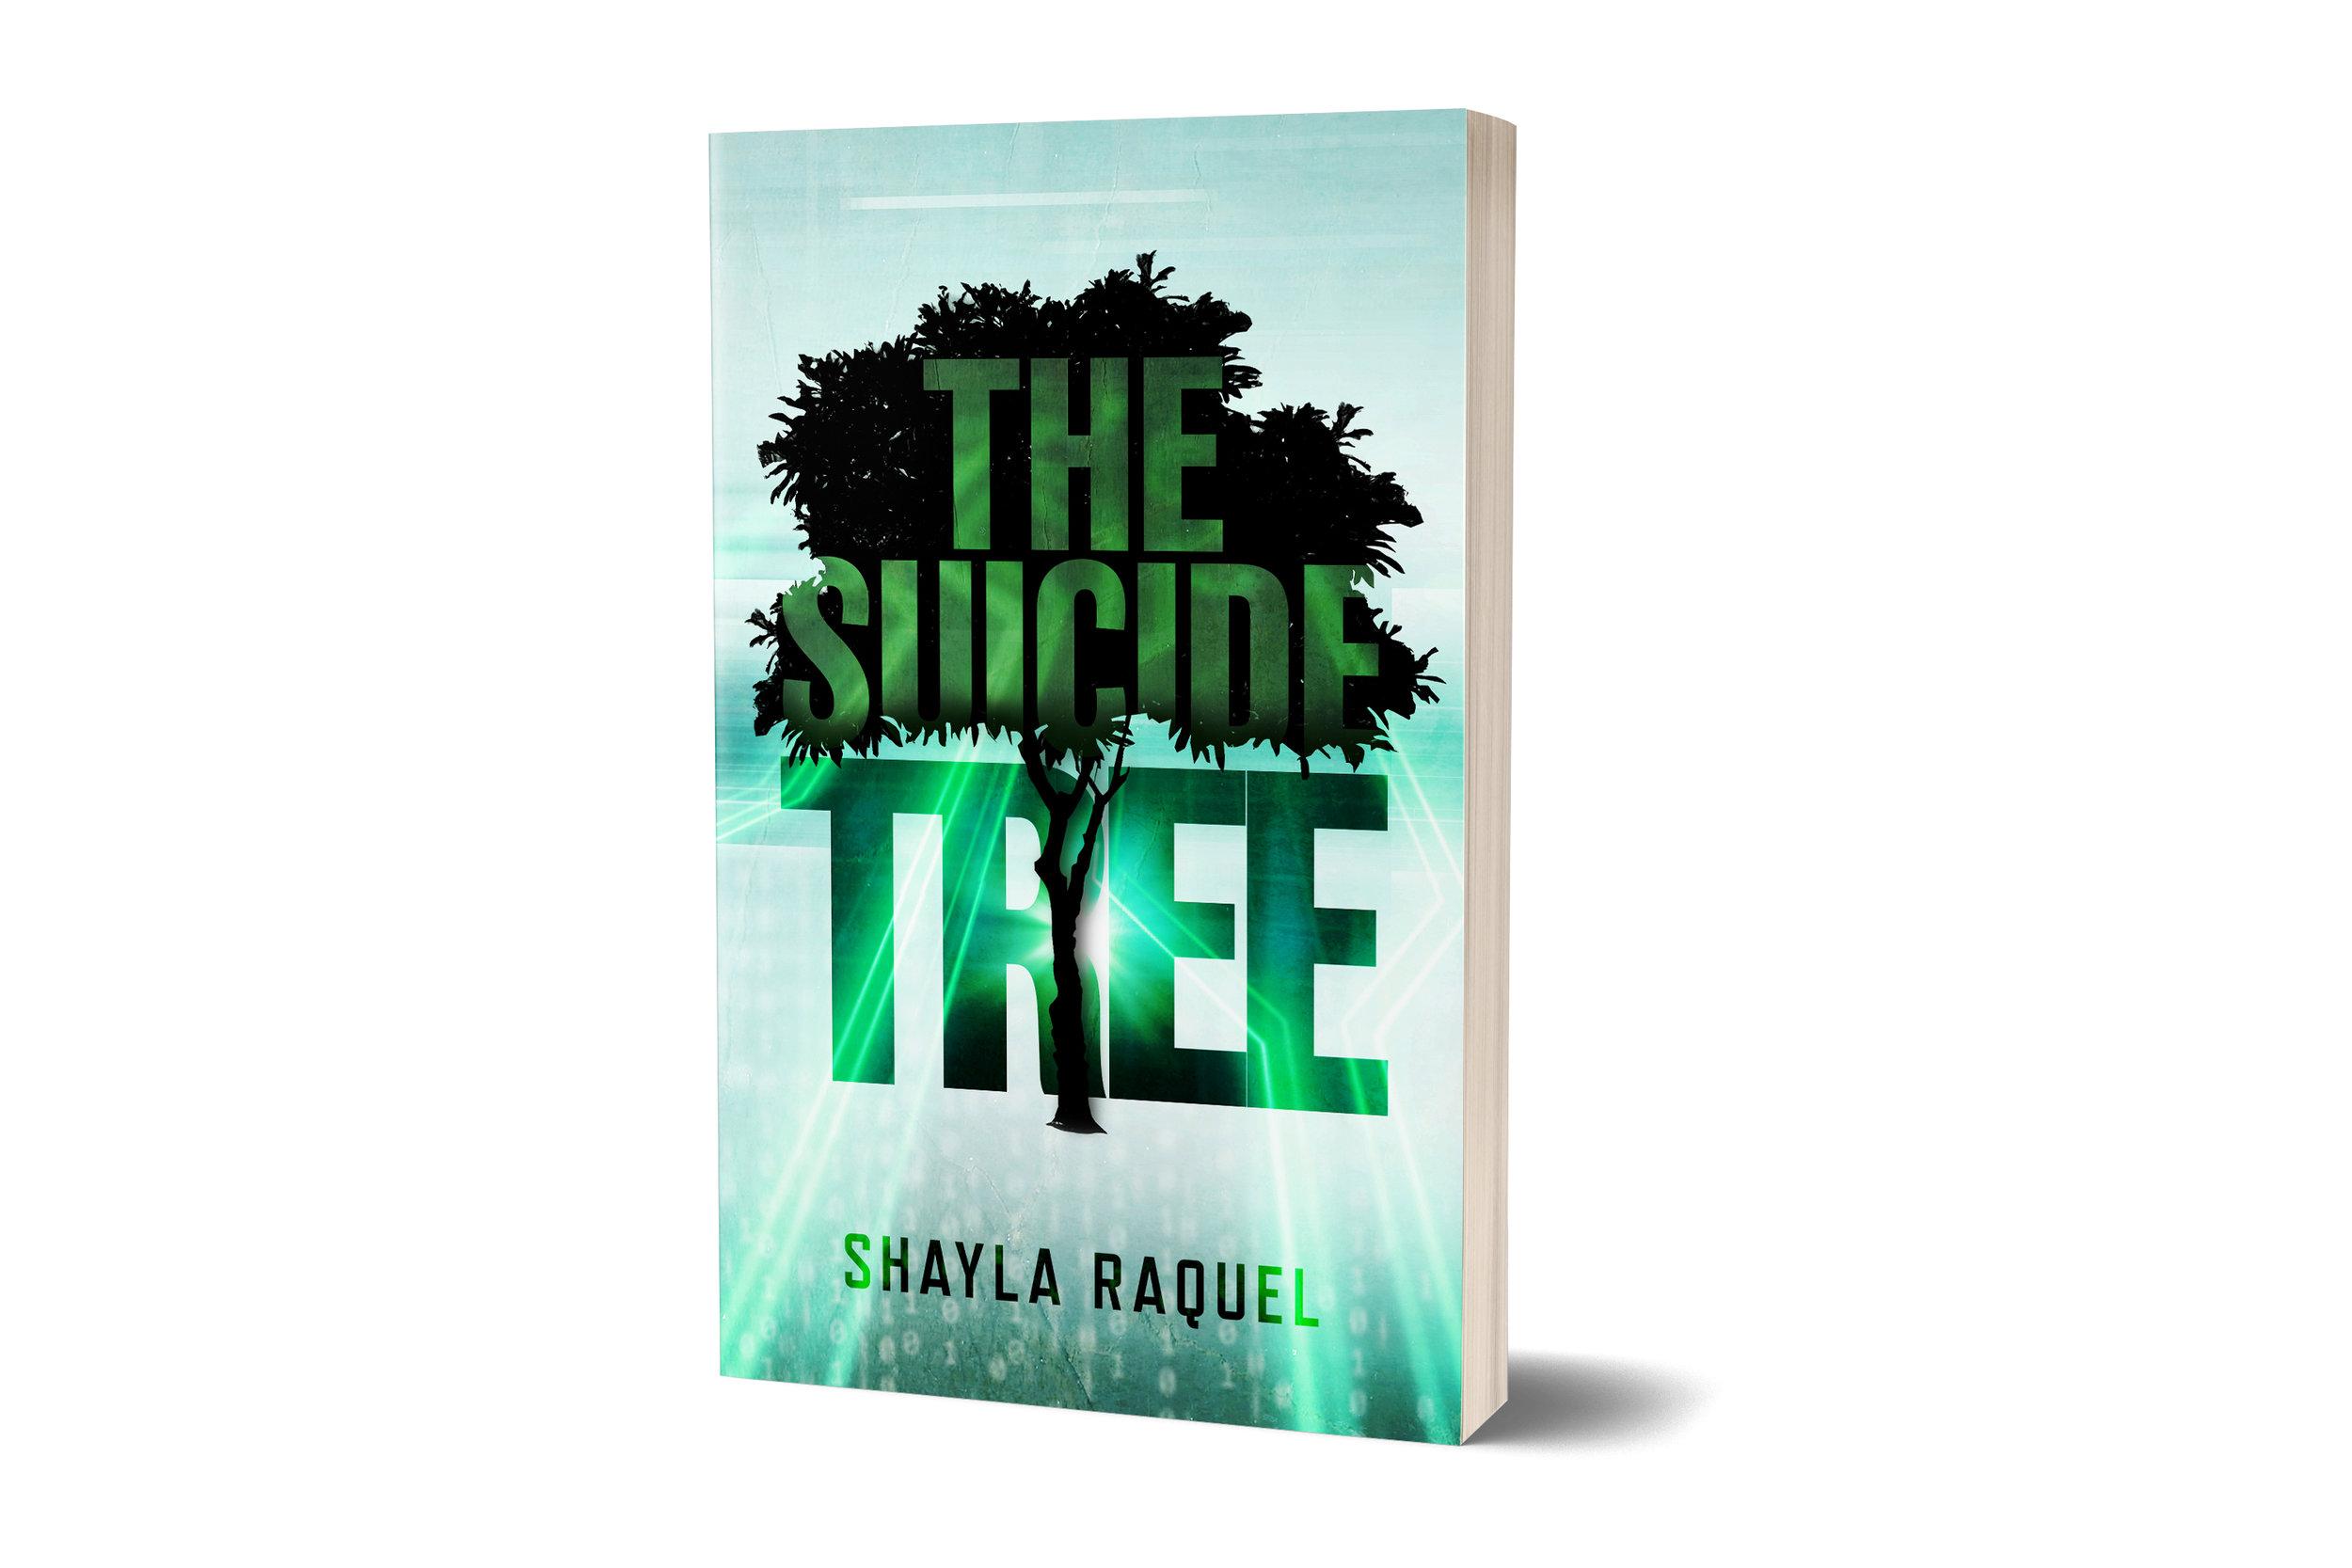 3-D The Suicide Tree 2.jpg